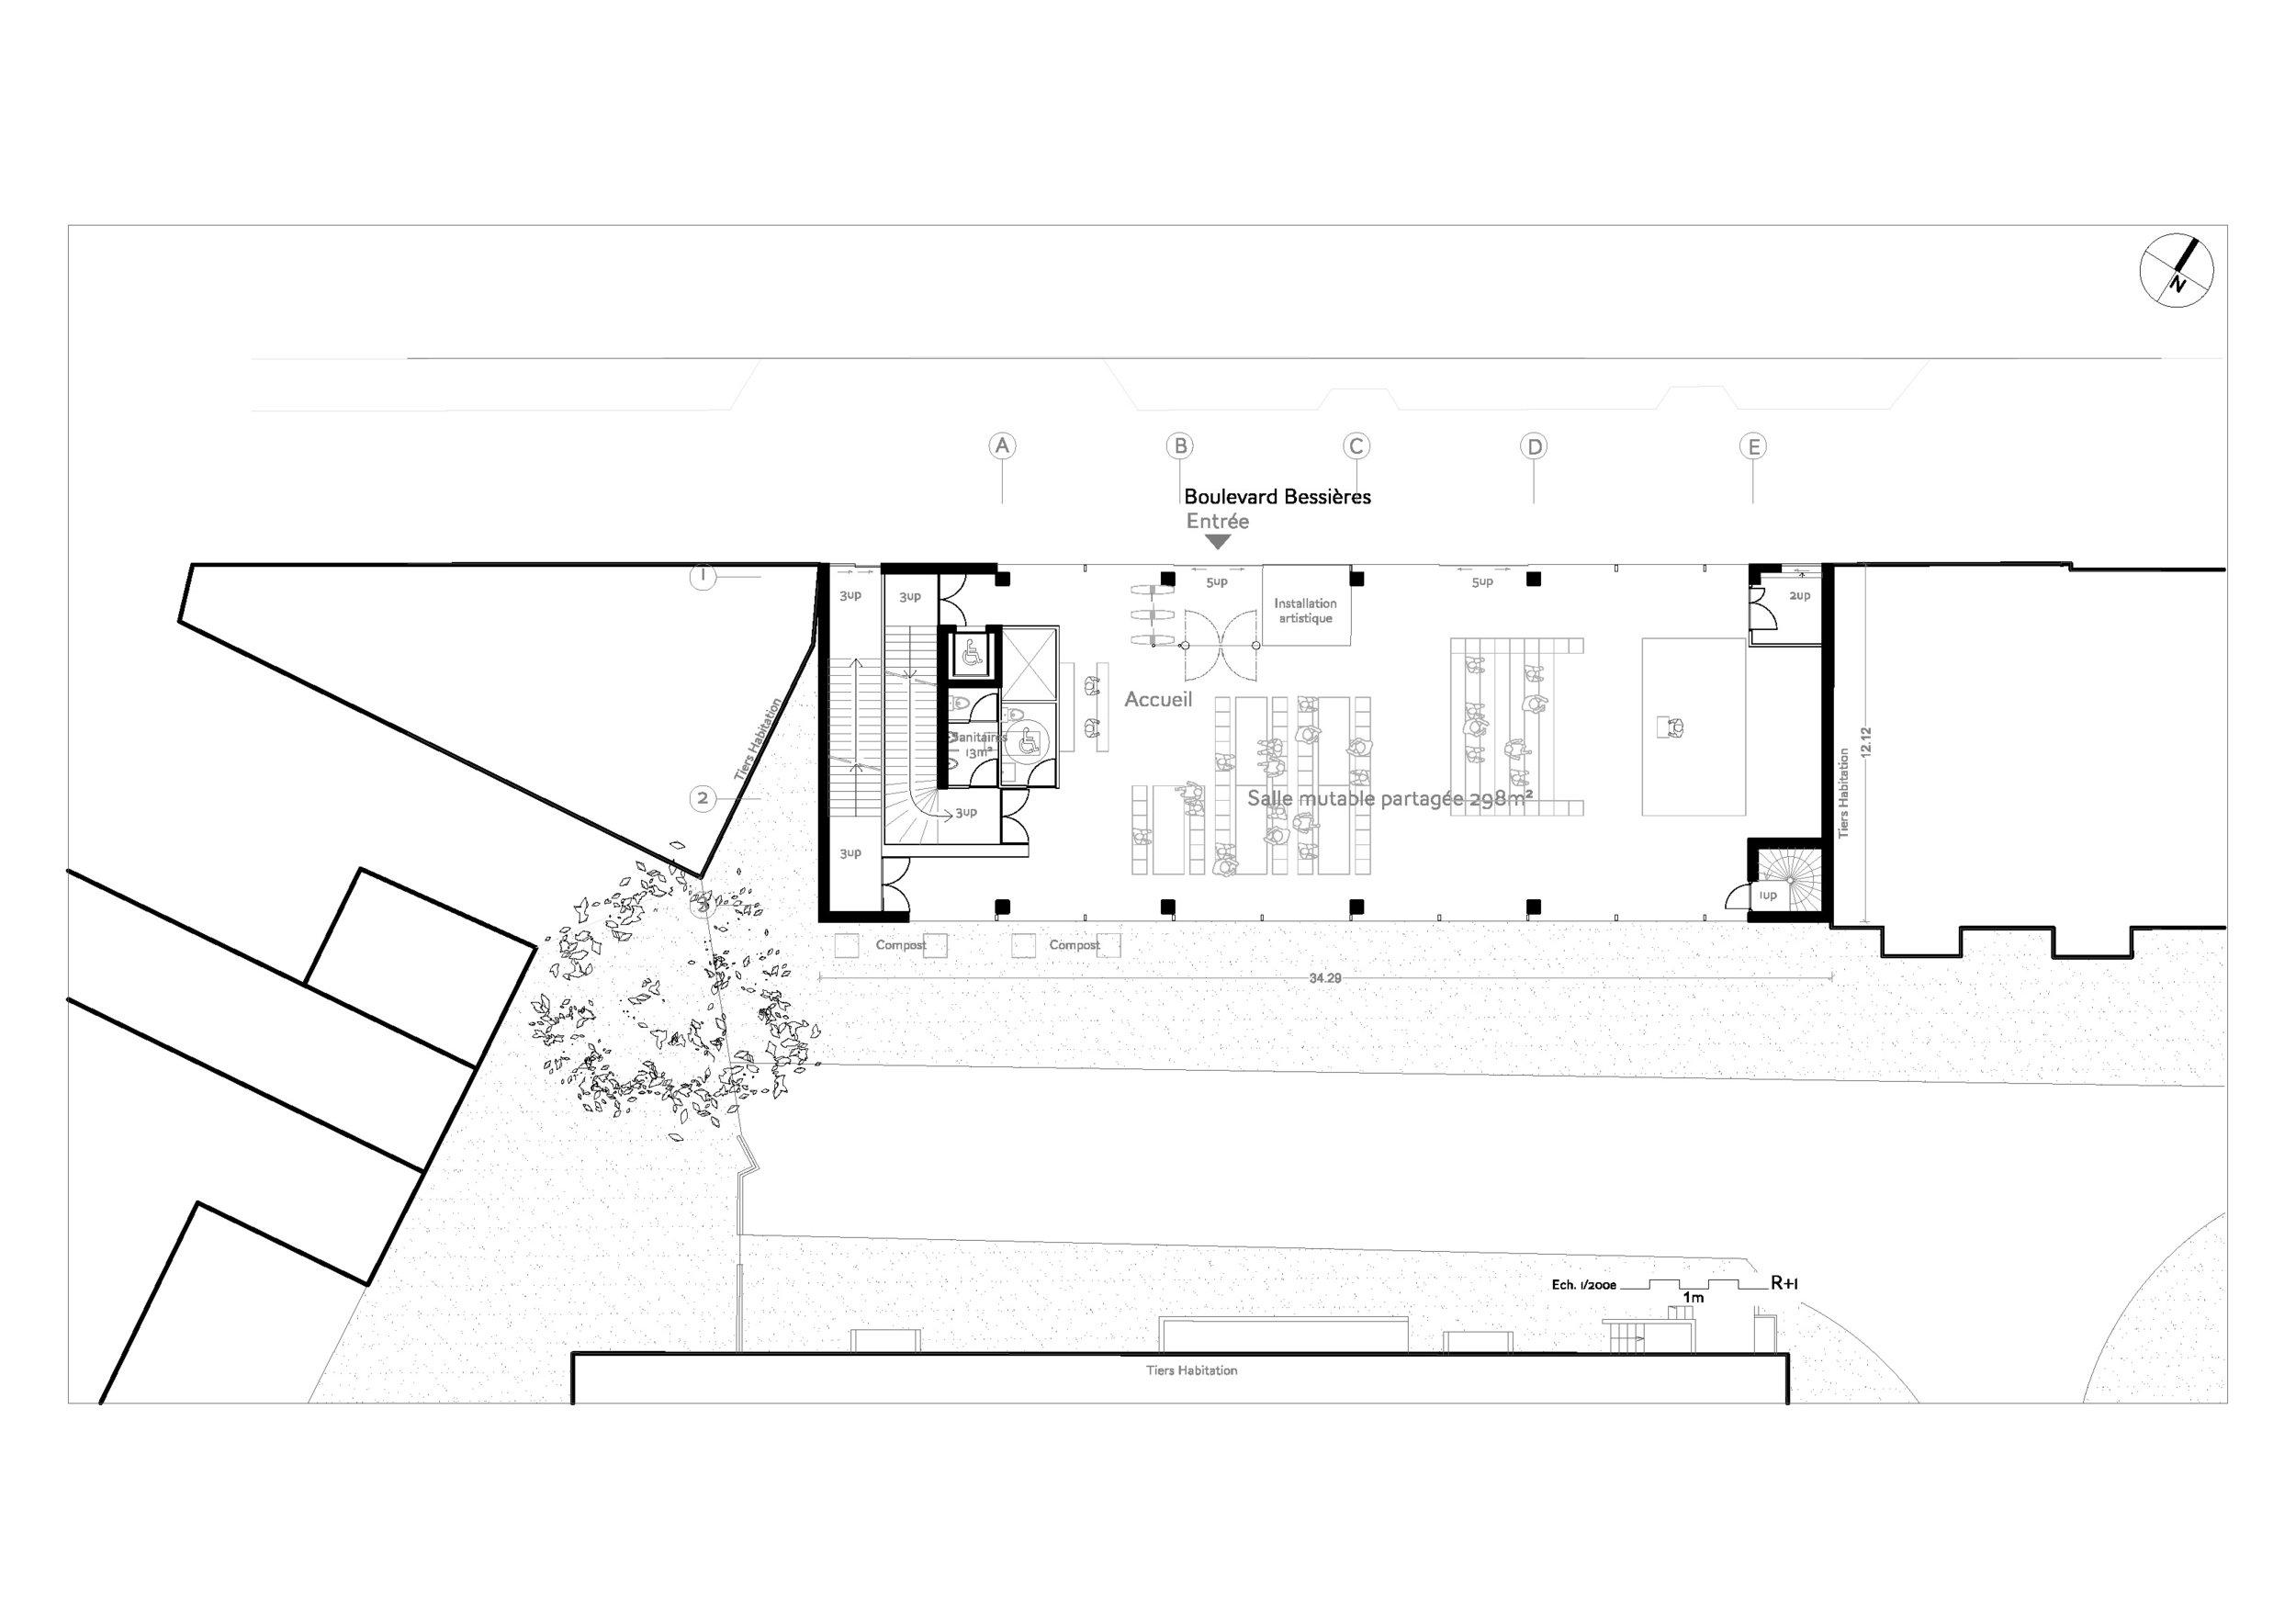 reinventer - paris- noc 42 - xavier - niel - ar - Studio - architectures - ecole 42   Kwame YAMGNANE nicolas sadirac - free (7).jpg